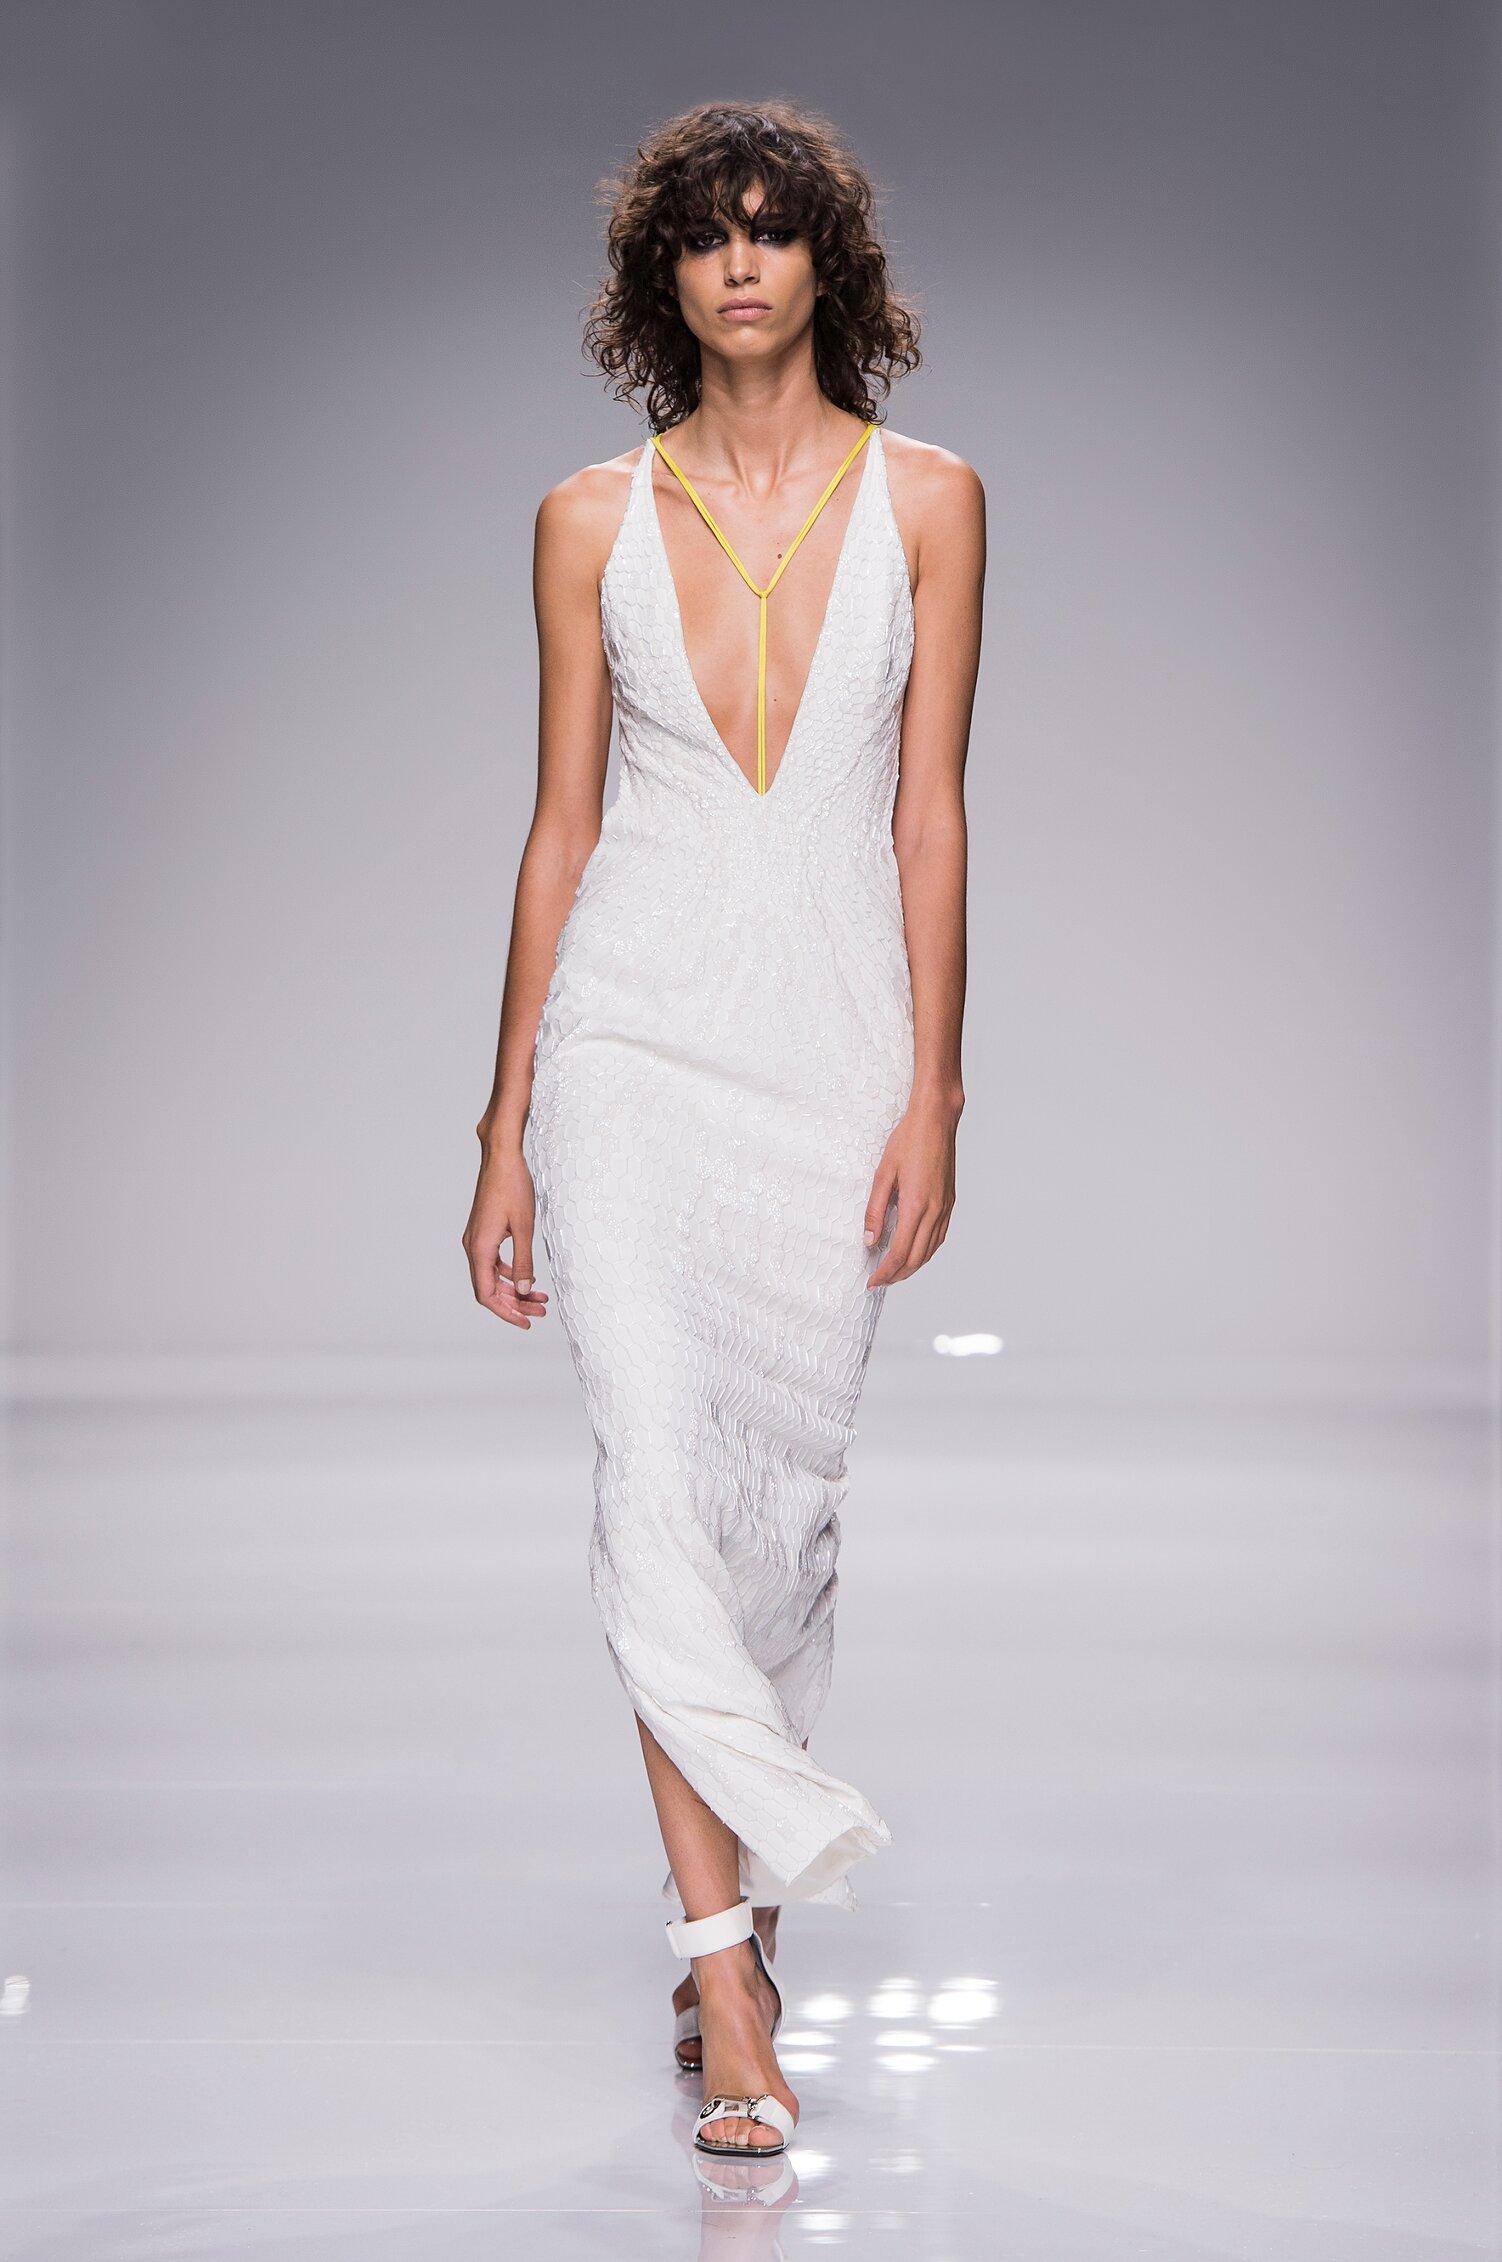 2016 Catwalk Atelier Versace Couture Summer